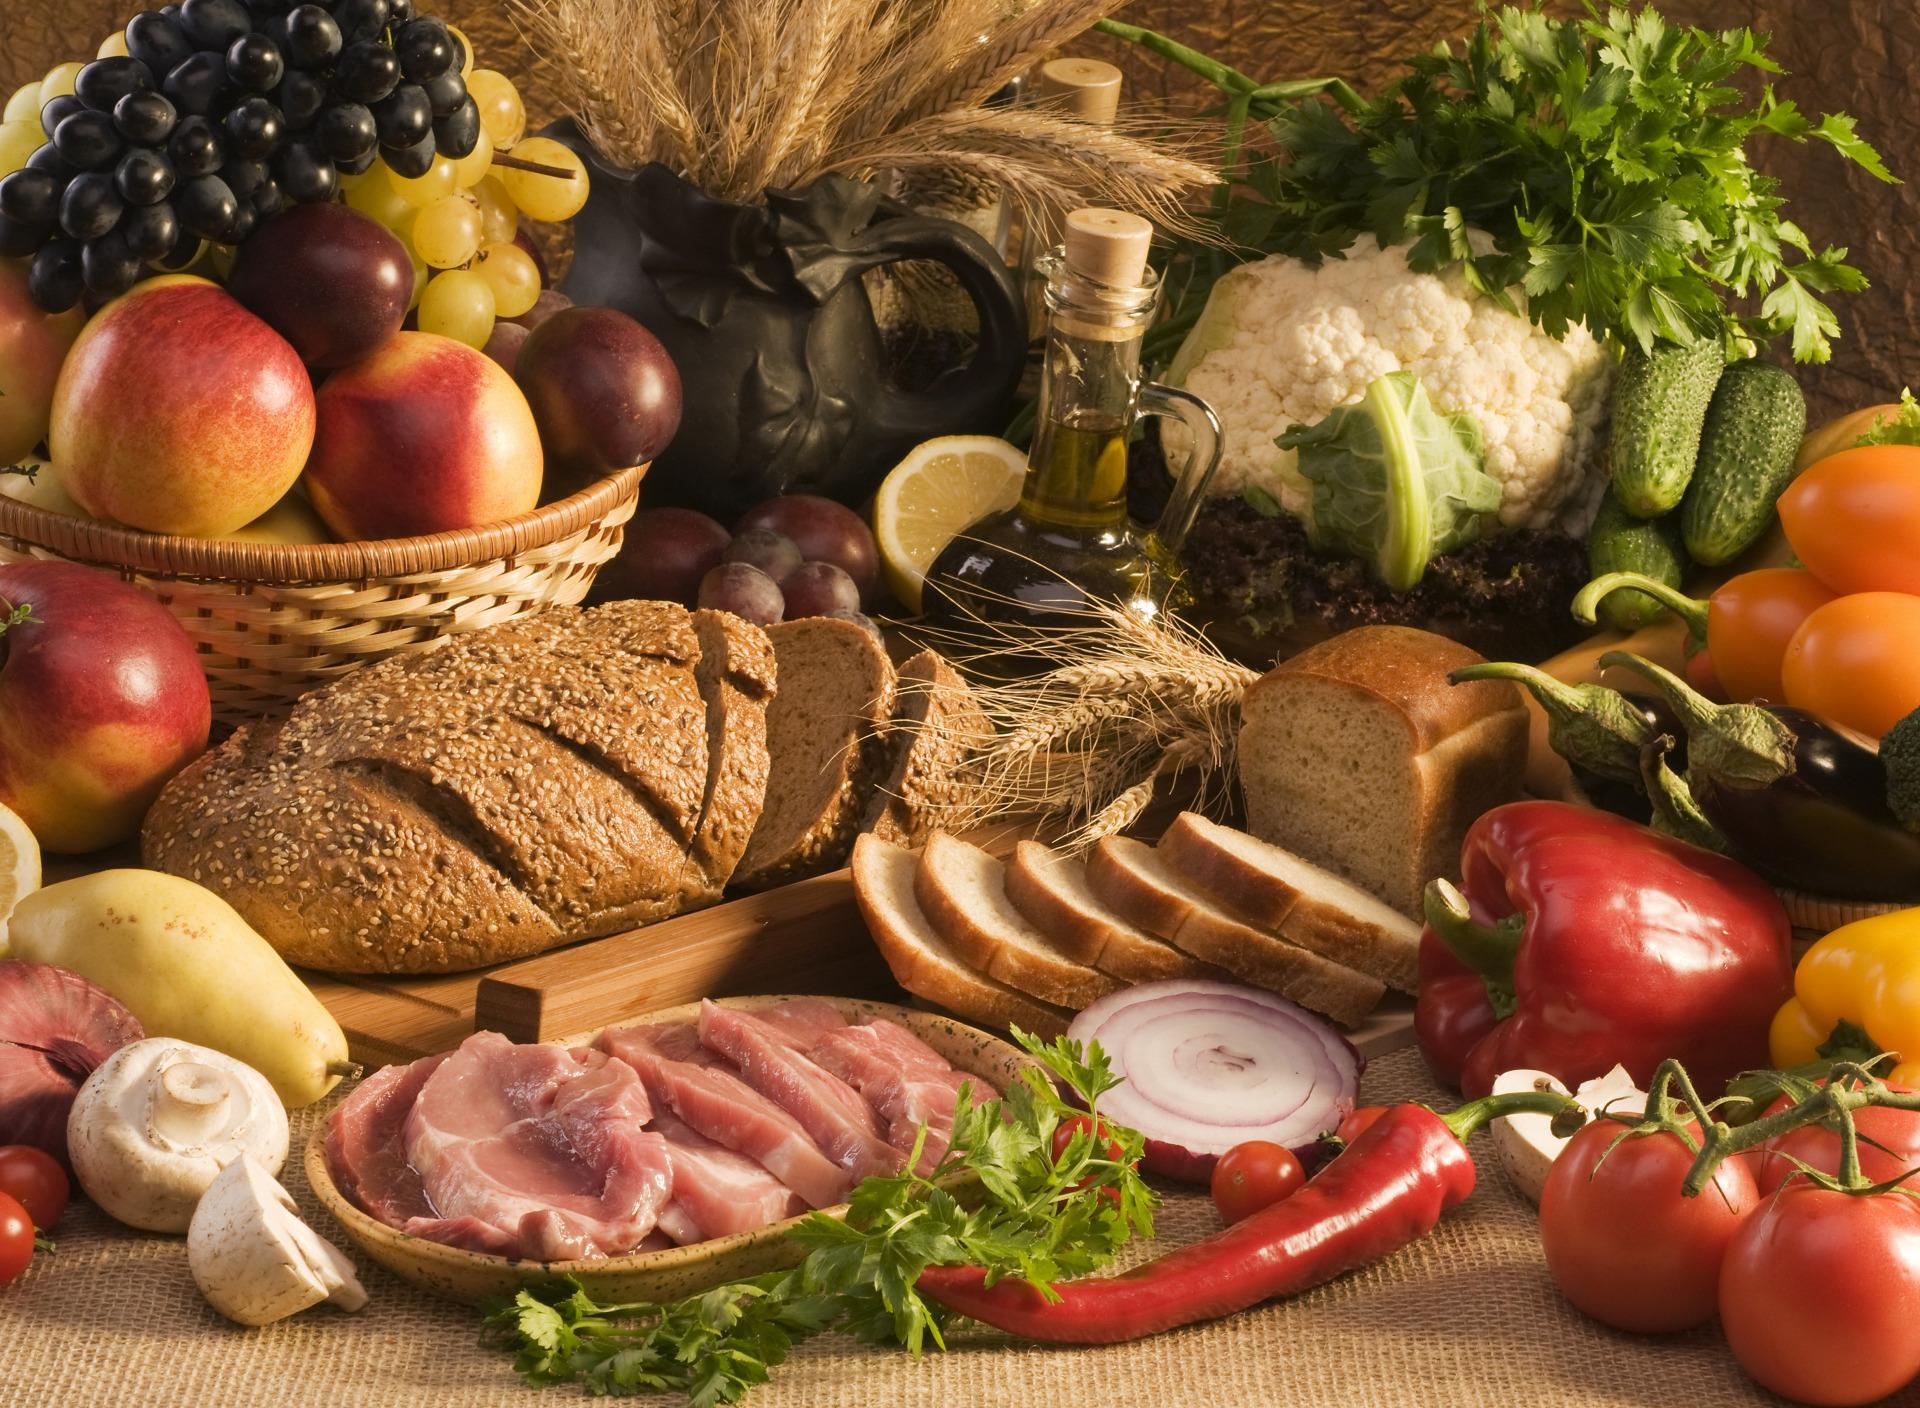 картинки мясо фрукты сразу впитали